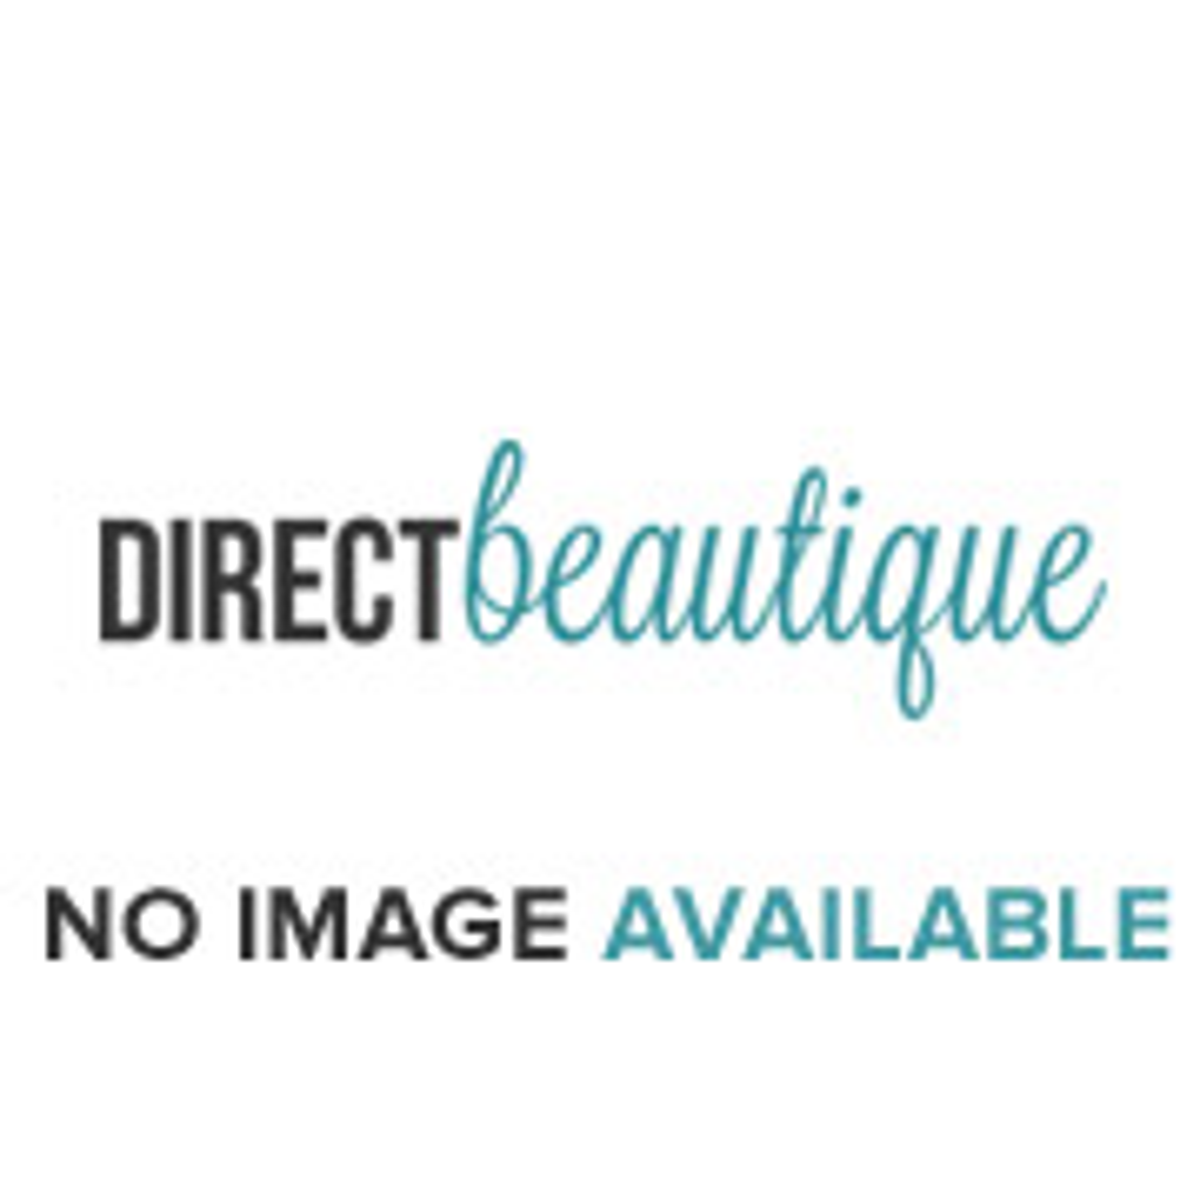 Revlon ColorStay Makeup Combination/Oily Skin 30ml - 350 Rich Tan